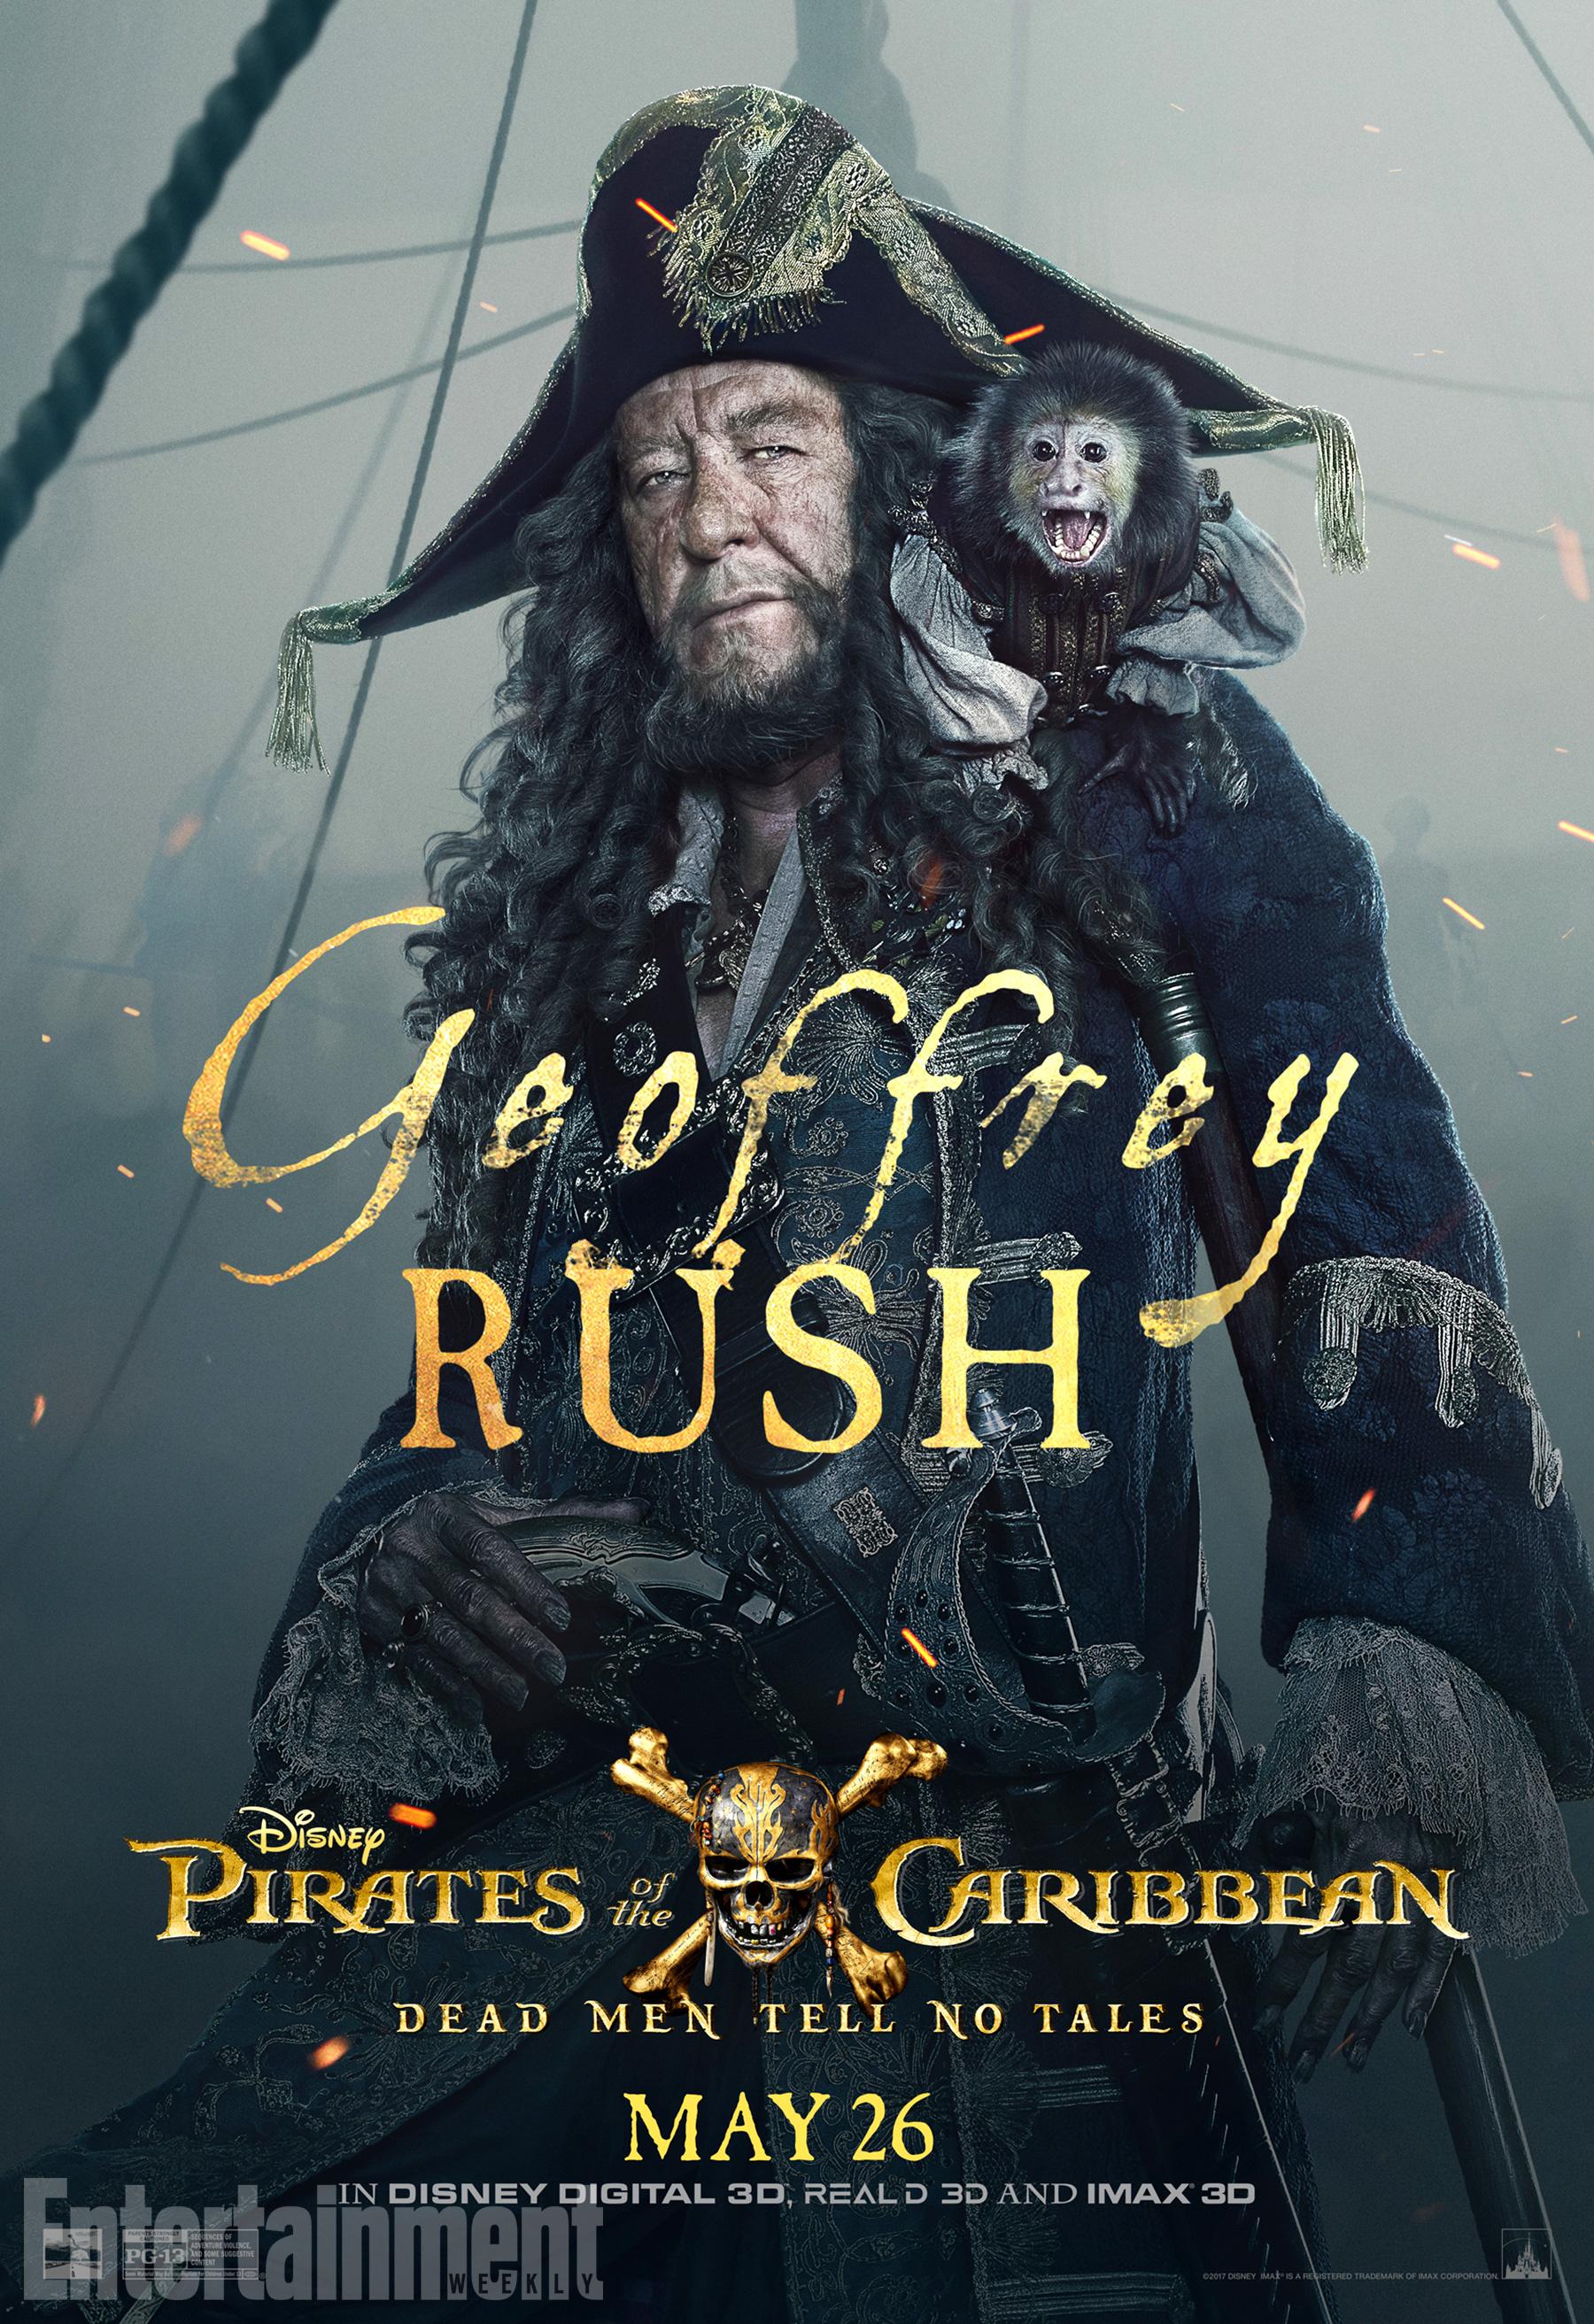 piratasdocaribe5 (2)